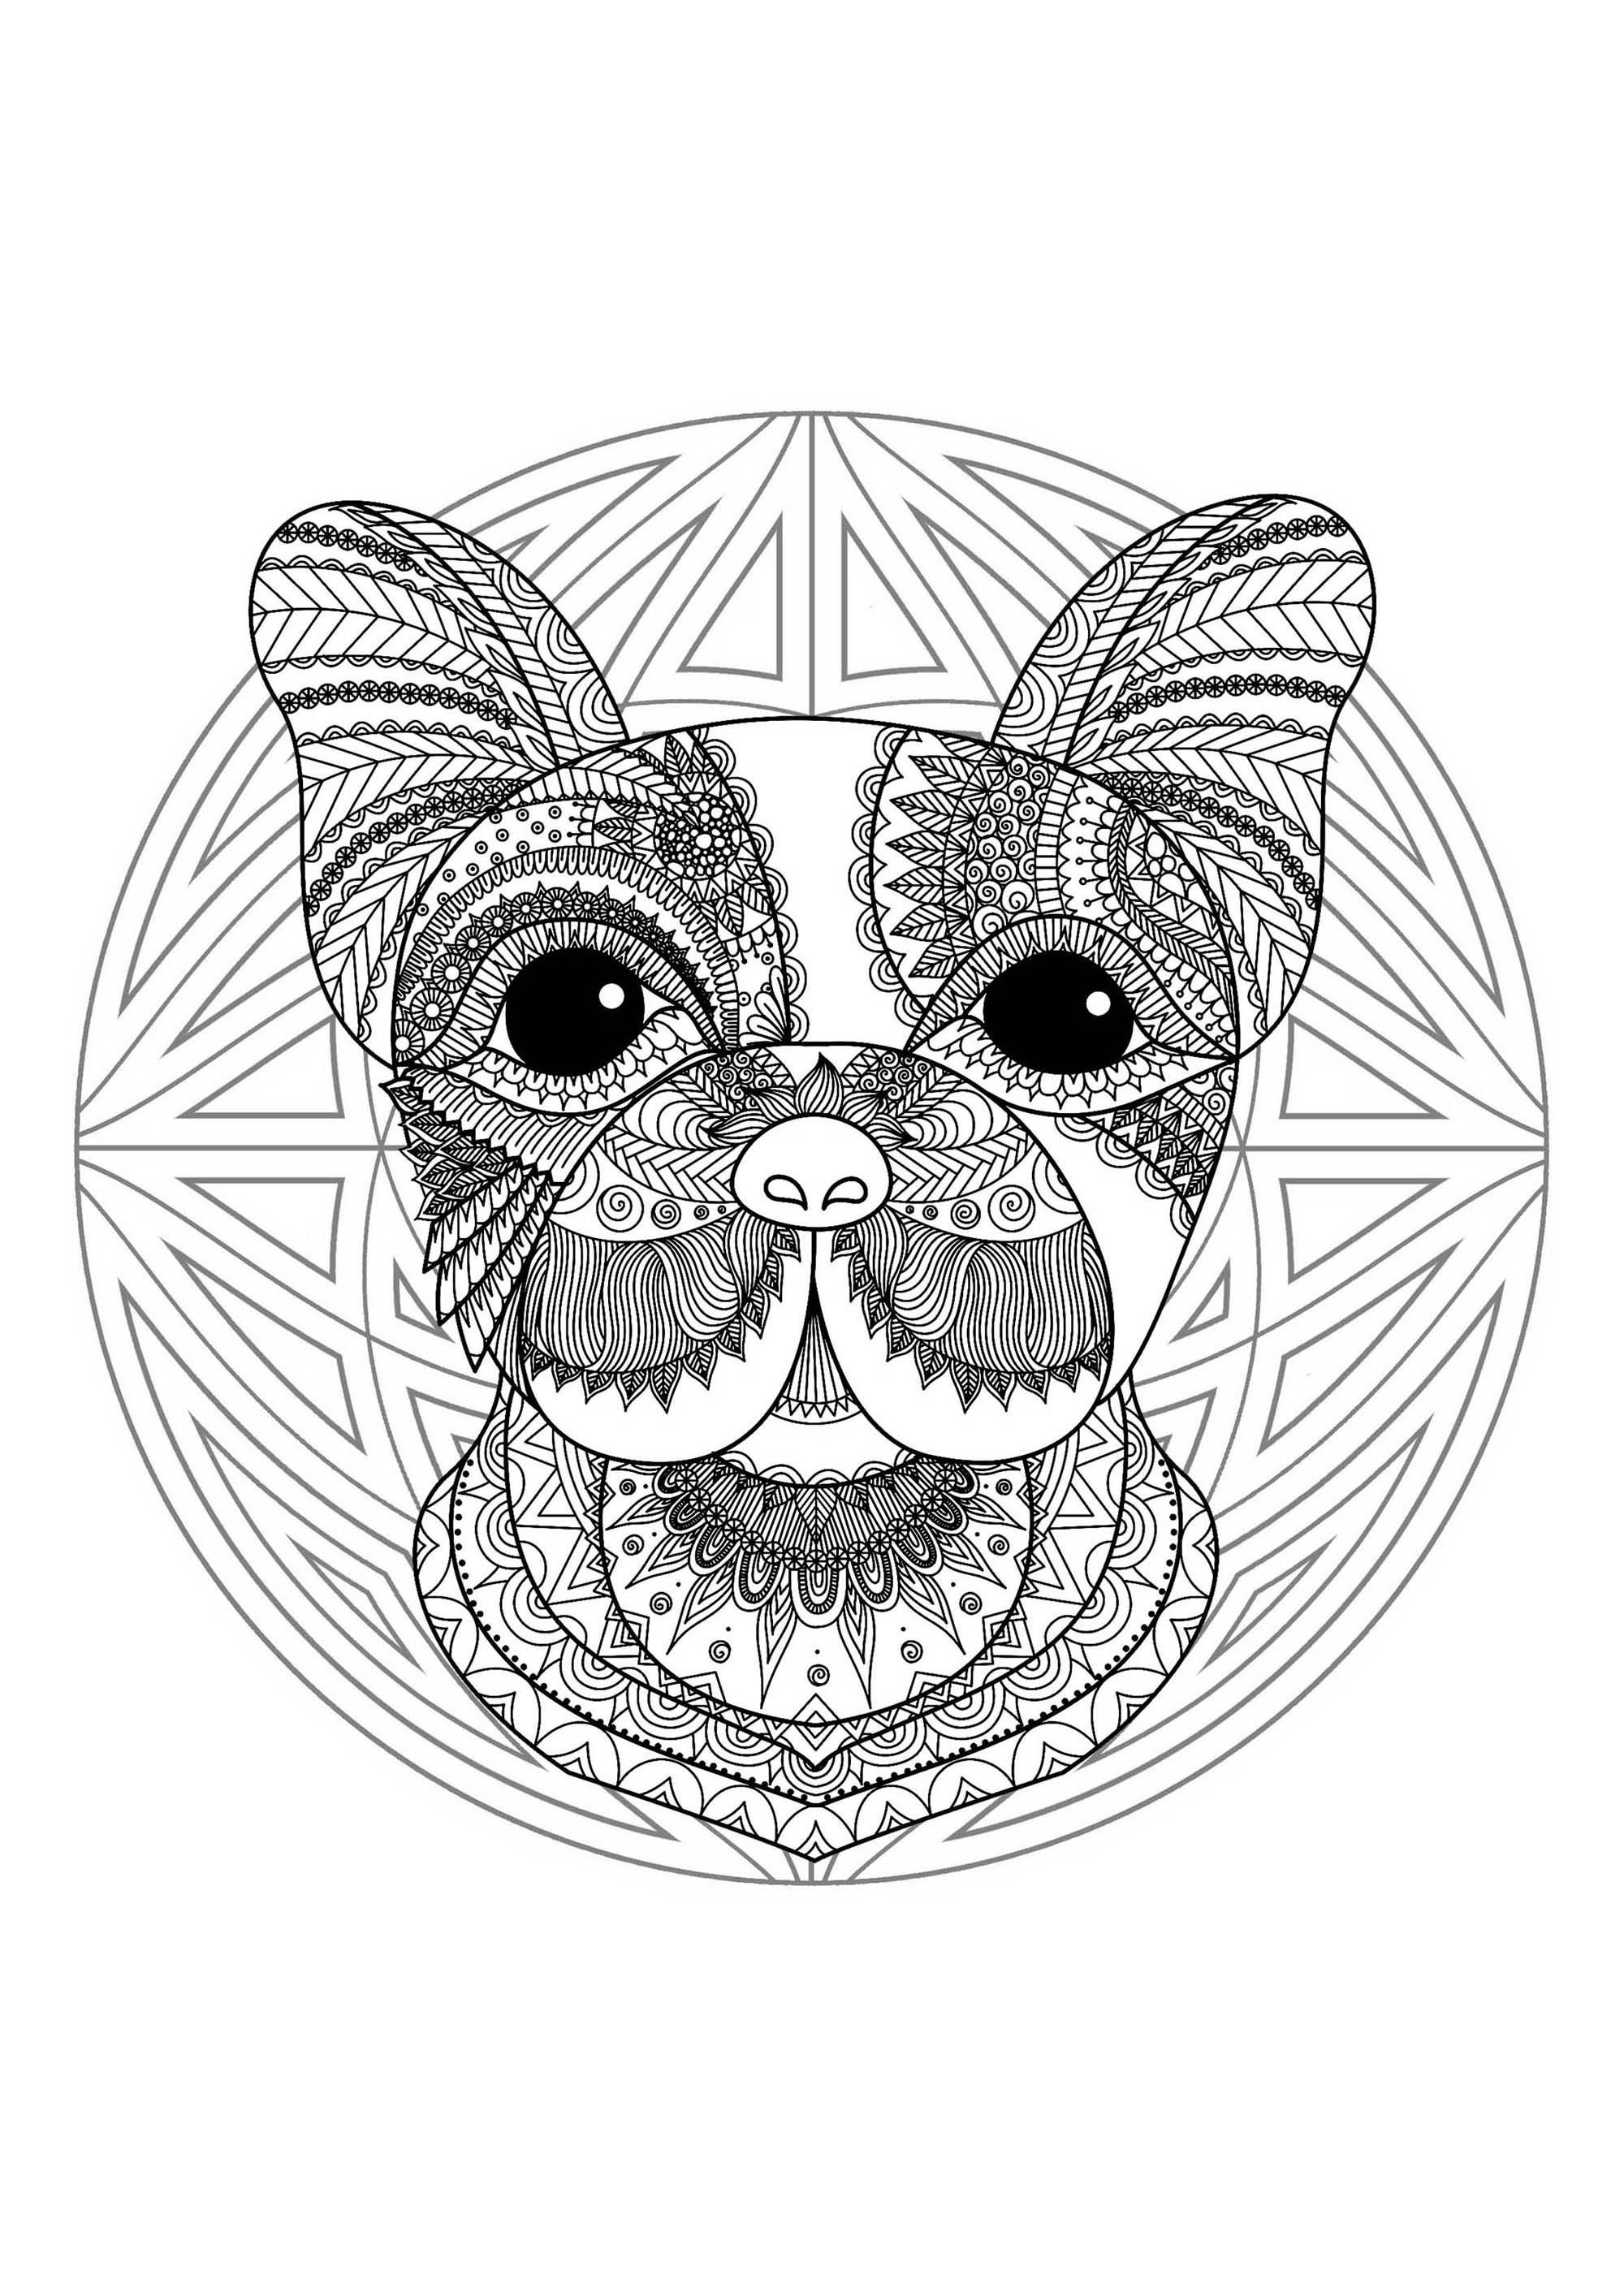 Mandala With Cute Dog Head And Geometric Patterns M Amp Alas